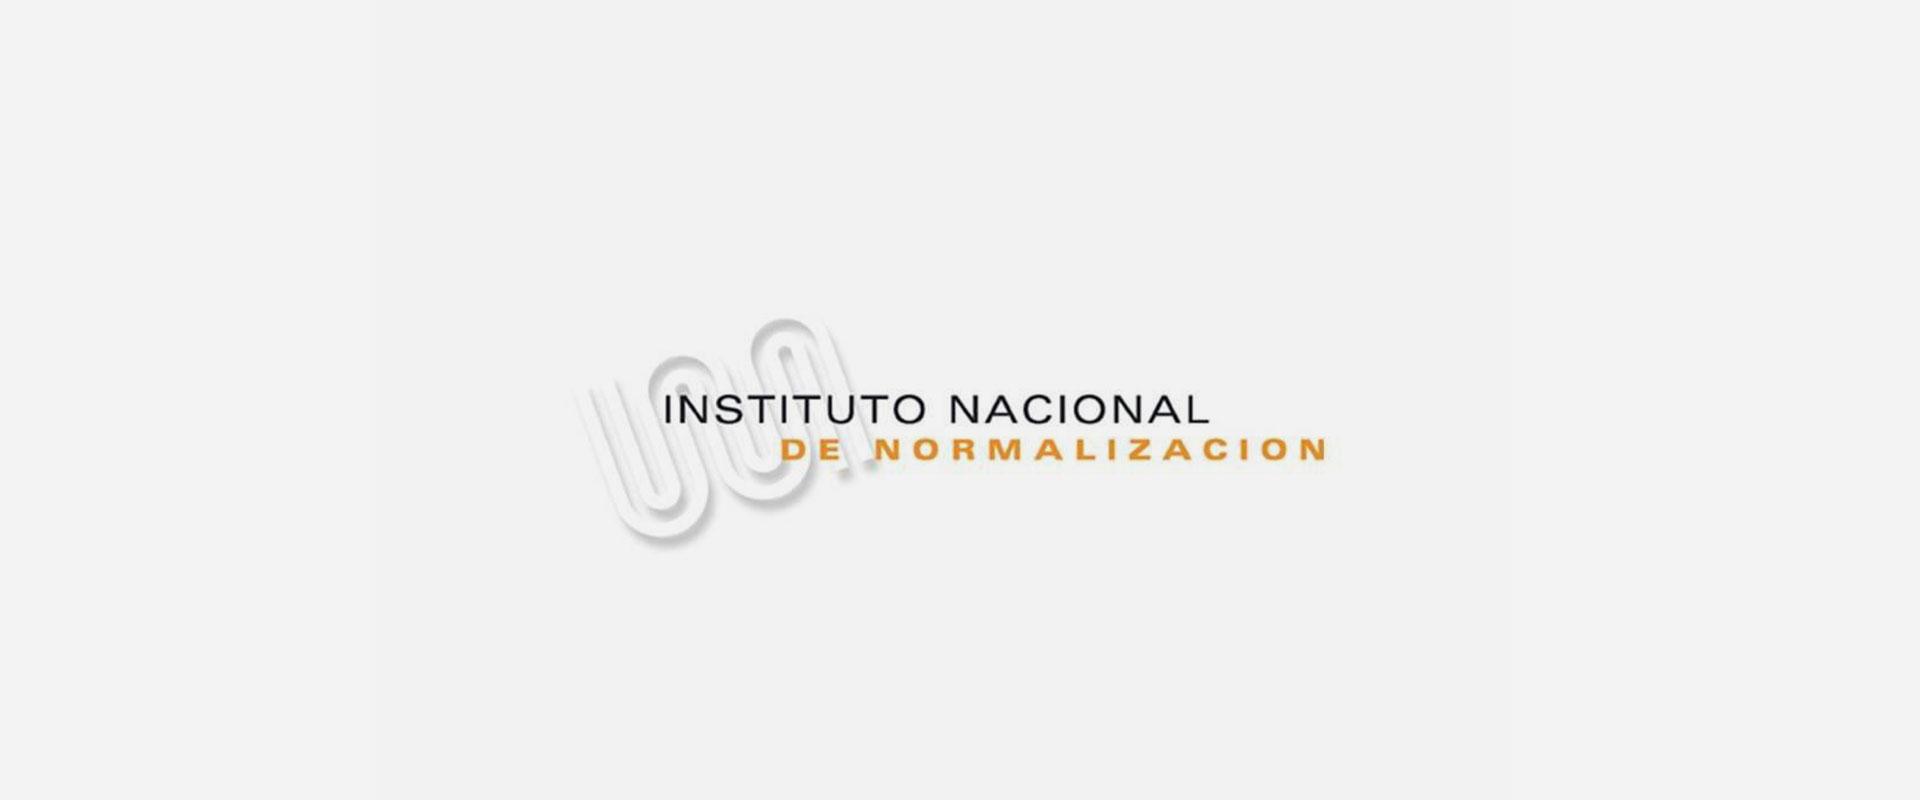 SEGEA ACREDITADO COMO ORGANISMO DE INSPECCIÓN TIPO A